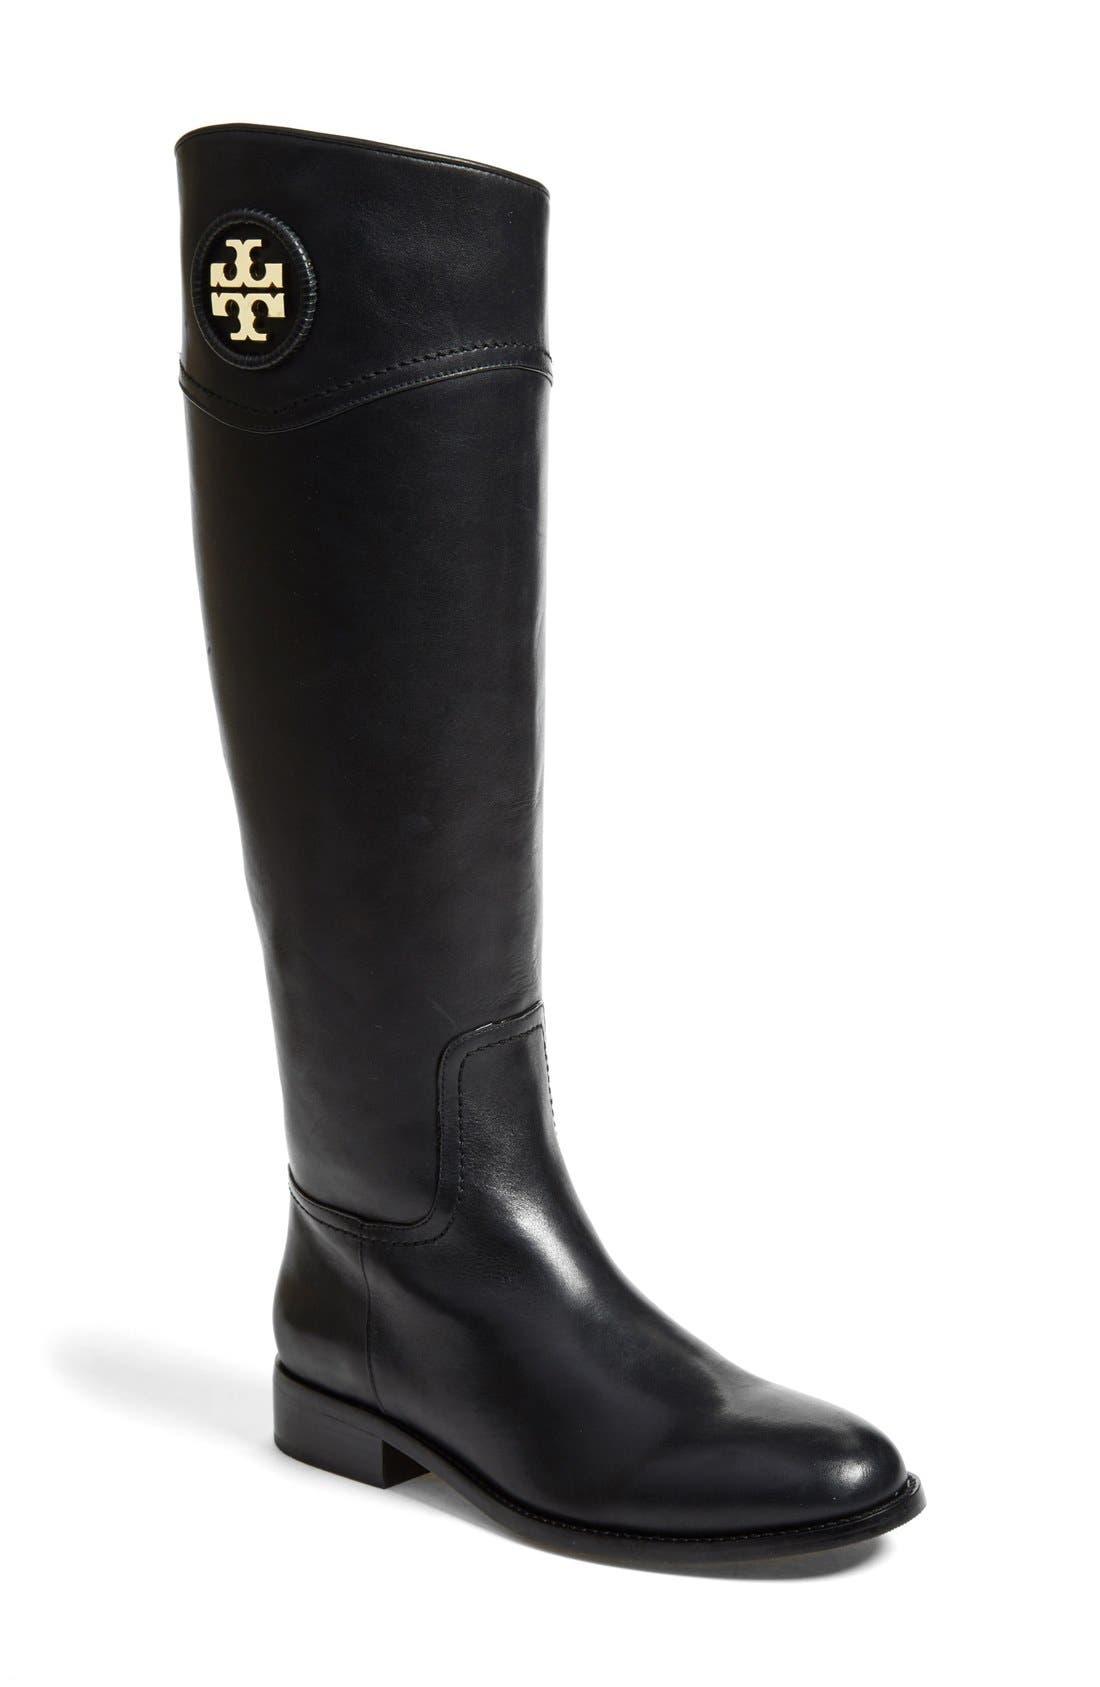 Alternate Image 1 Selected - Tory Burch 'Ashlynn' Wide Calf Riding Boot (Women)